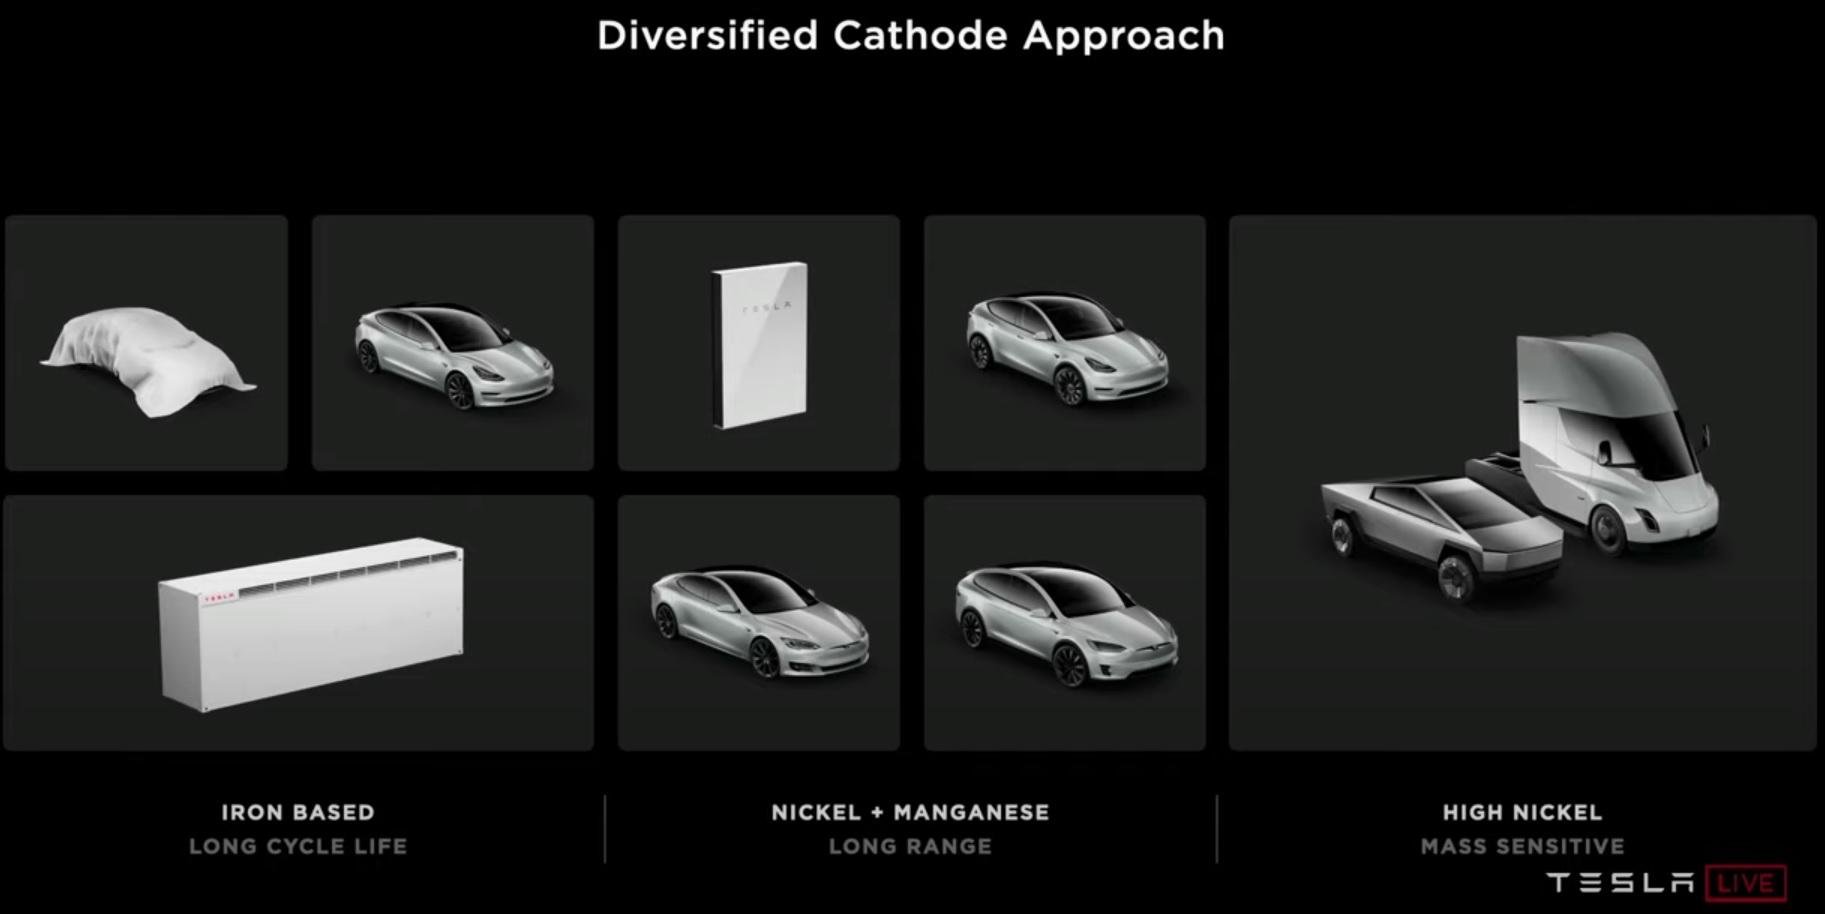 2020 05 Tesla Battery Day - Diversified Cathode .jpg